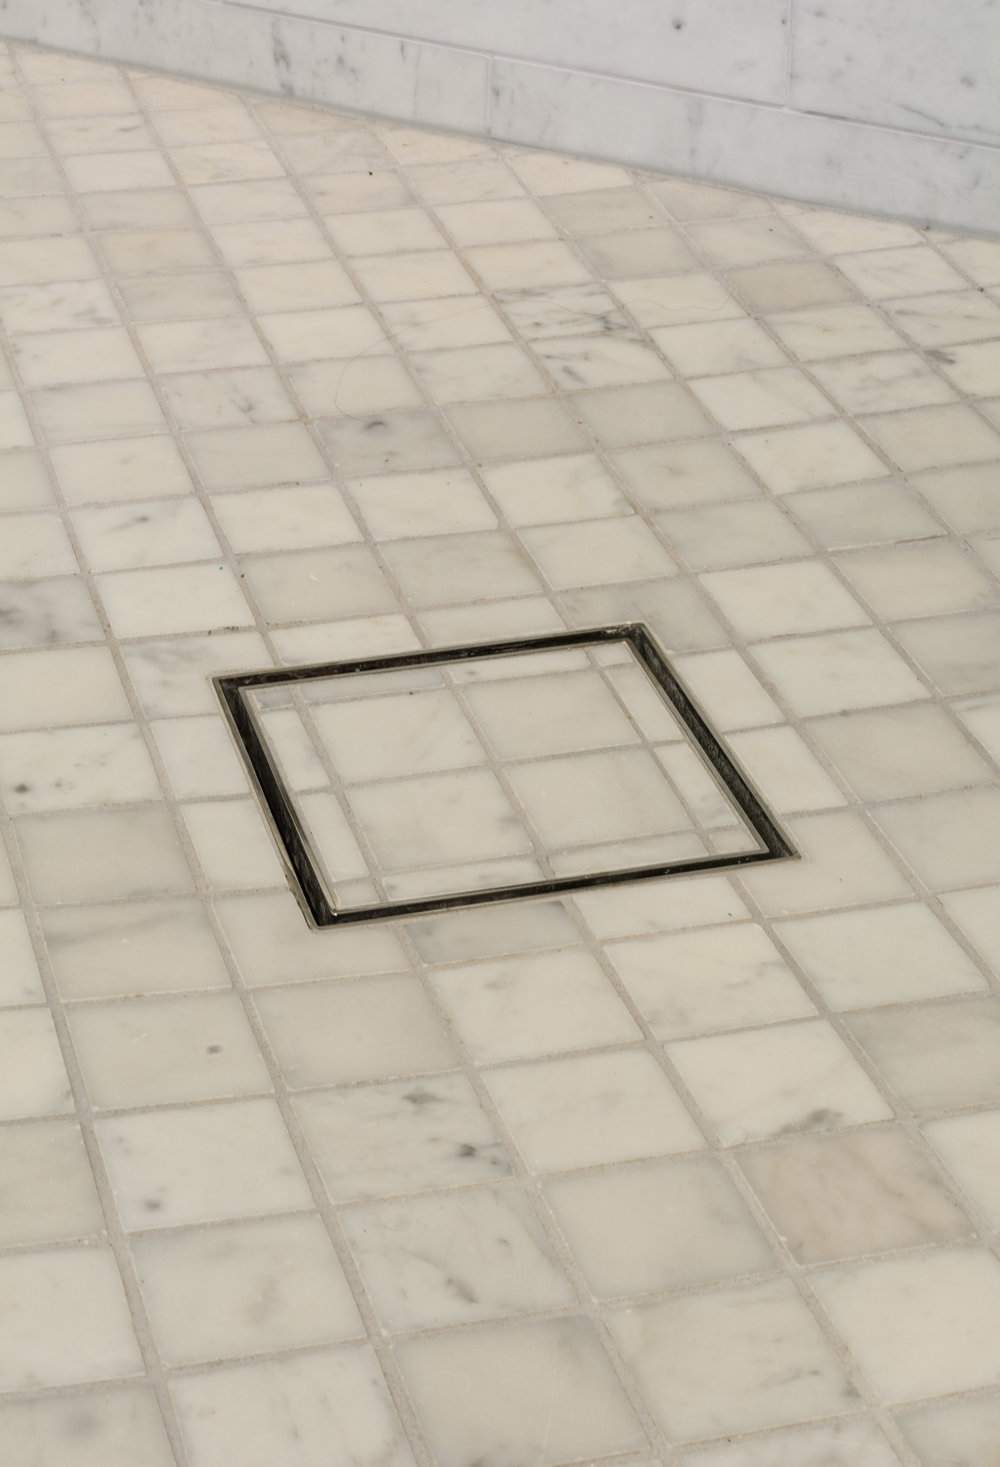 Shower drain: a discreet square design